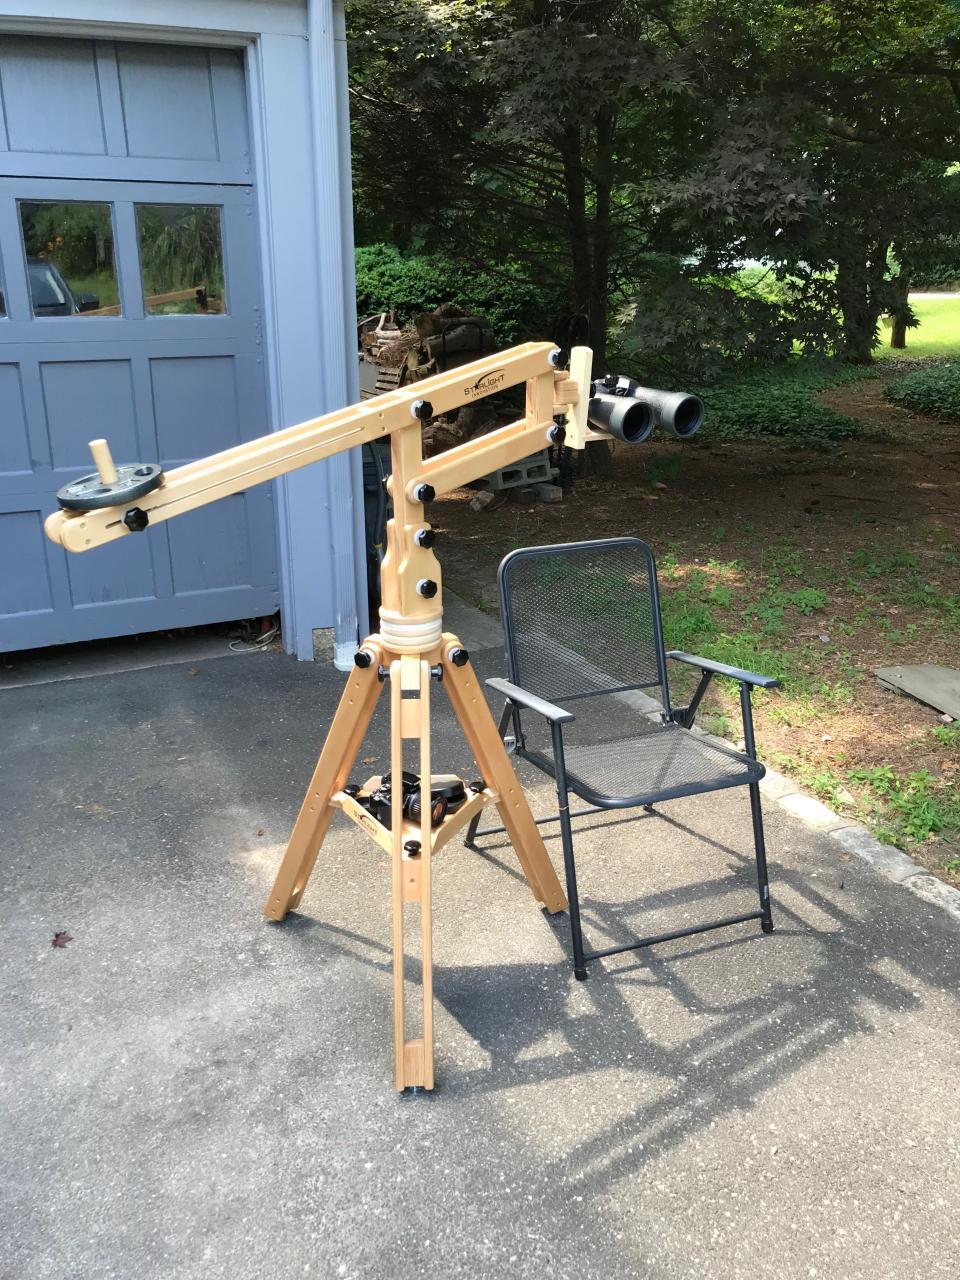 The setup: Fujinon Polaris, Starlight Innovation parallelogram mount, & Tri-Light tripod